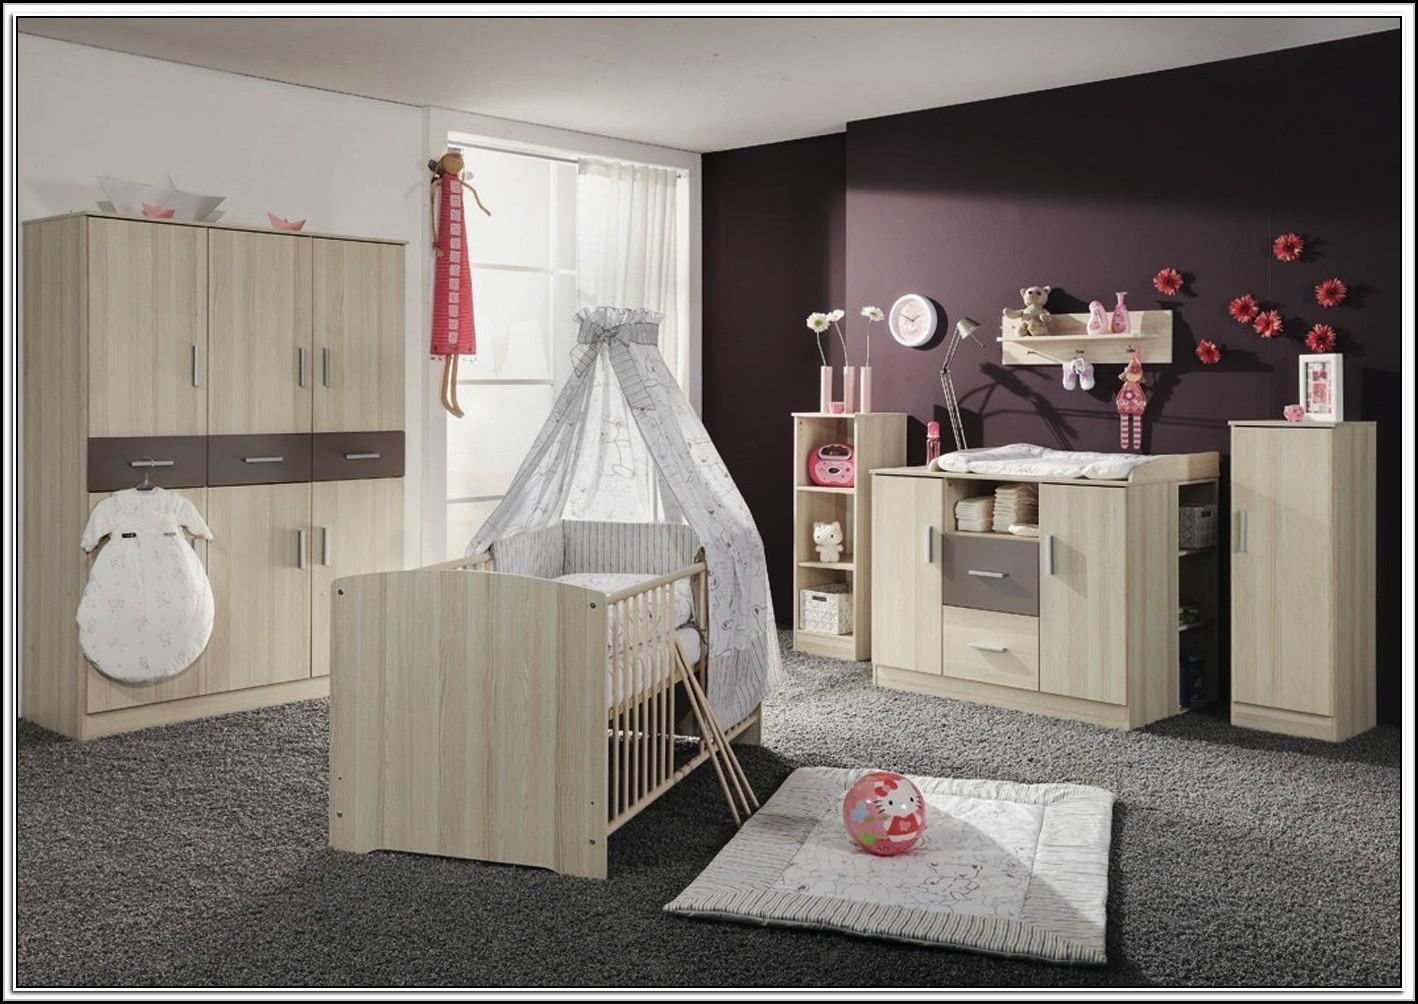 Arthur Berndt Kinderzimmer Lara - Kinderzimme : House und ...